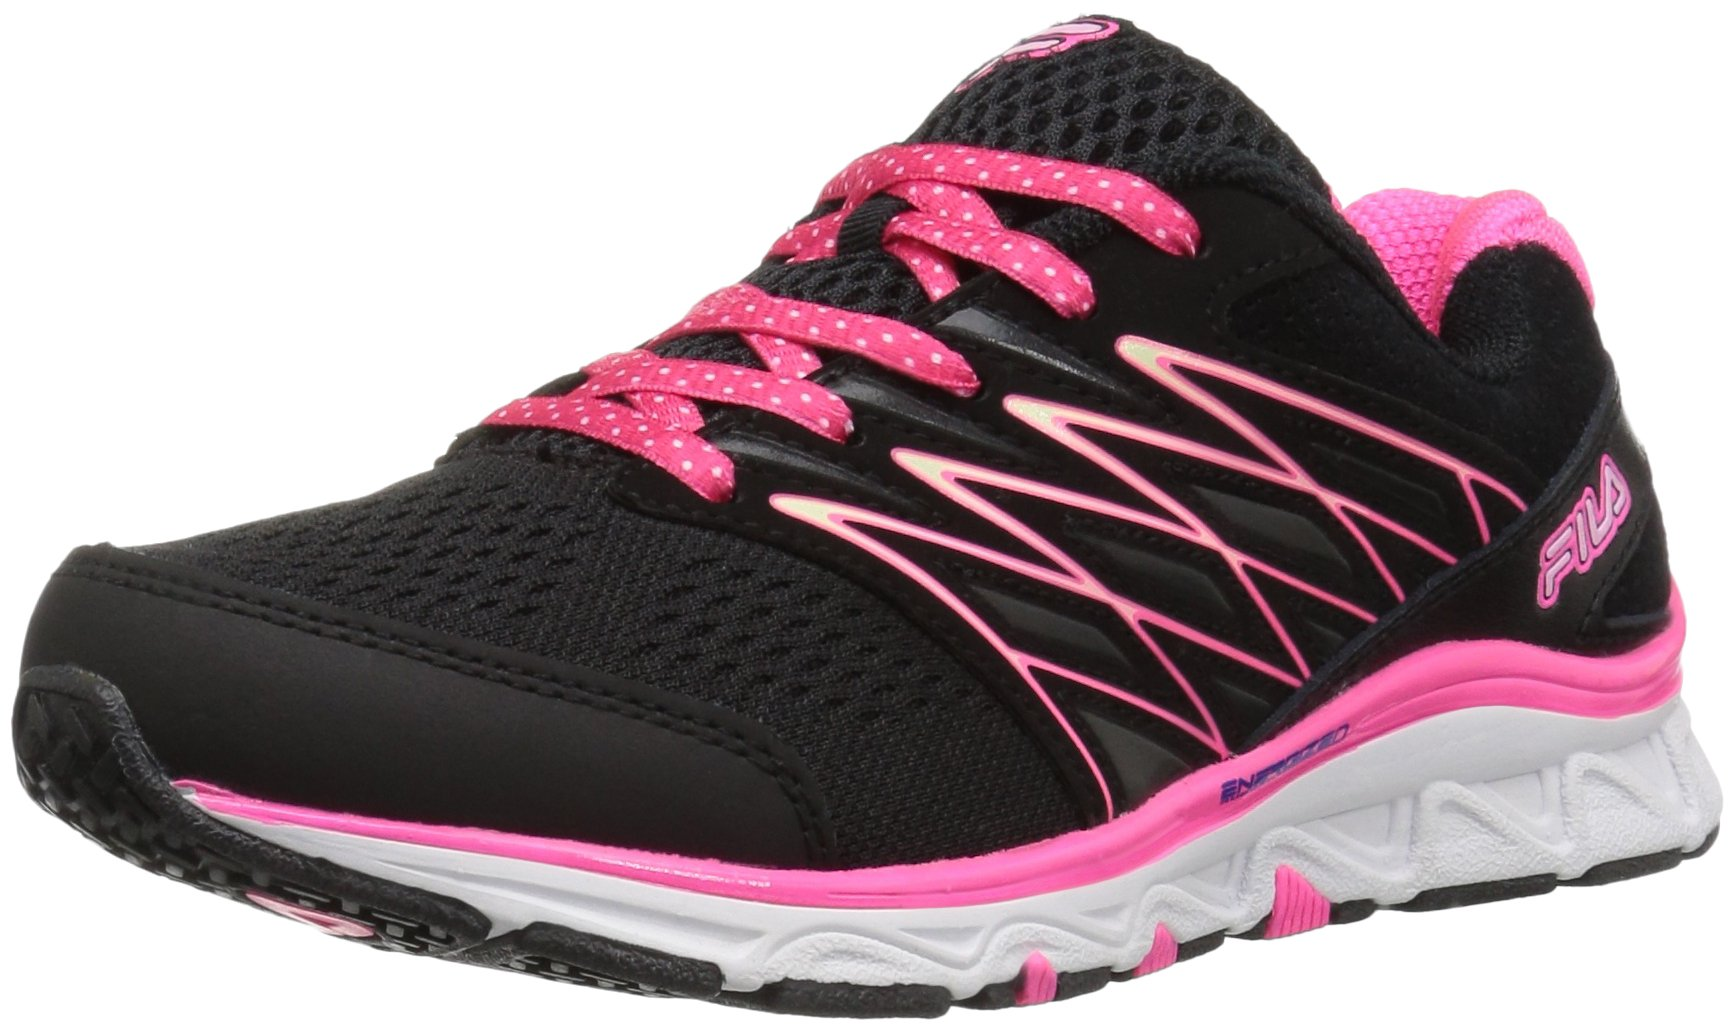 Fila Girls' Gallactic Skate Shoe, Black/Knockout Pink/Cotton Candy, 13 M US Little Kid